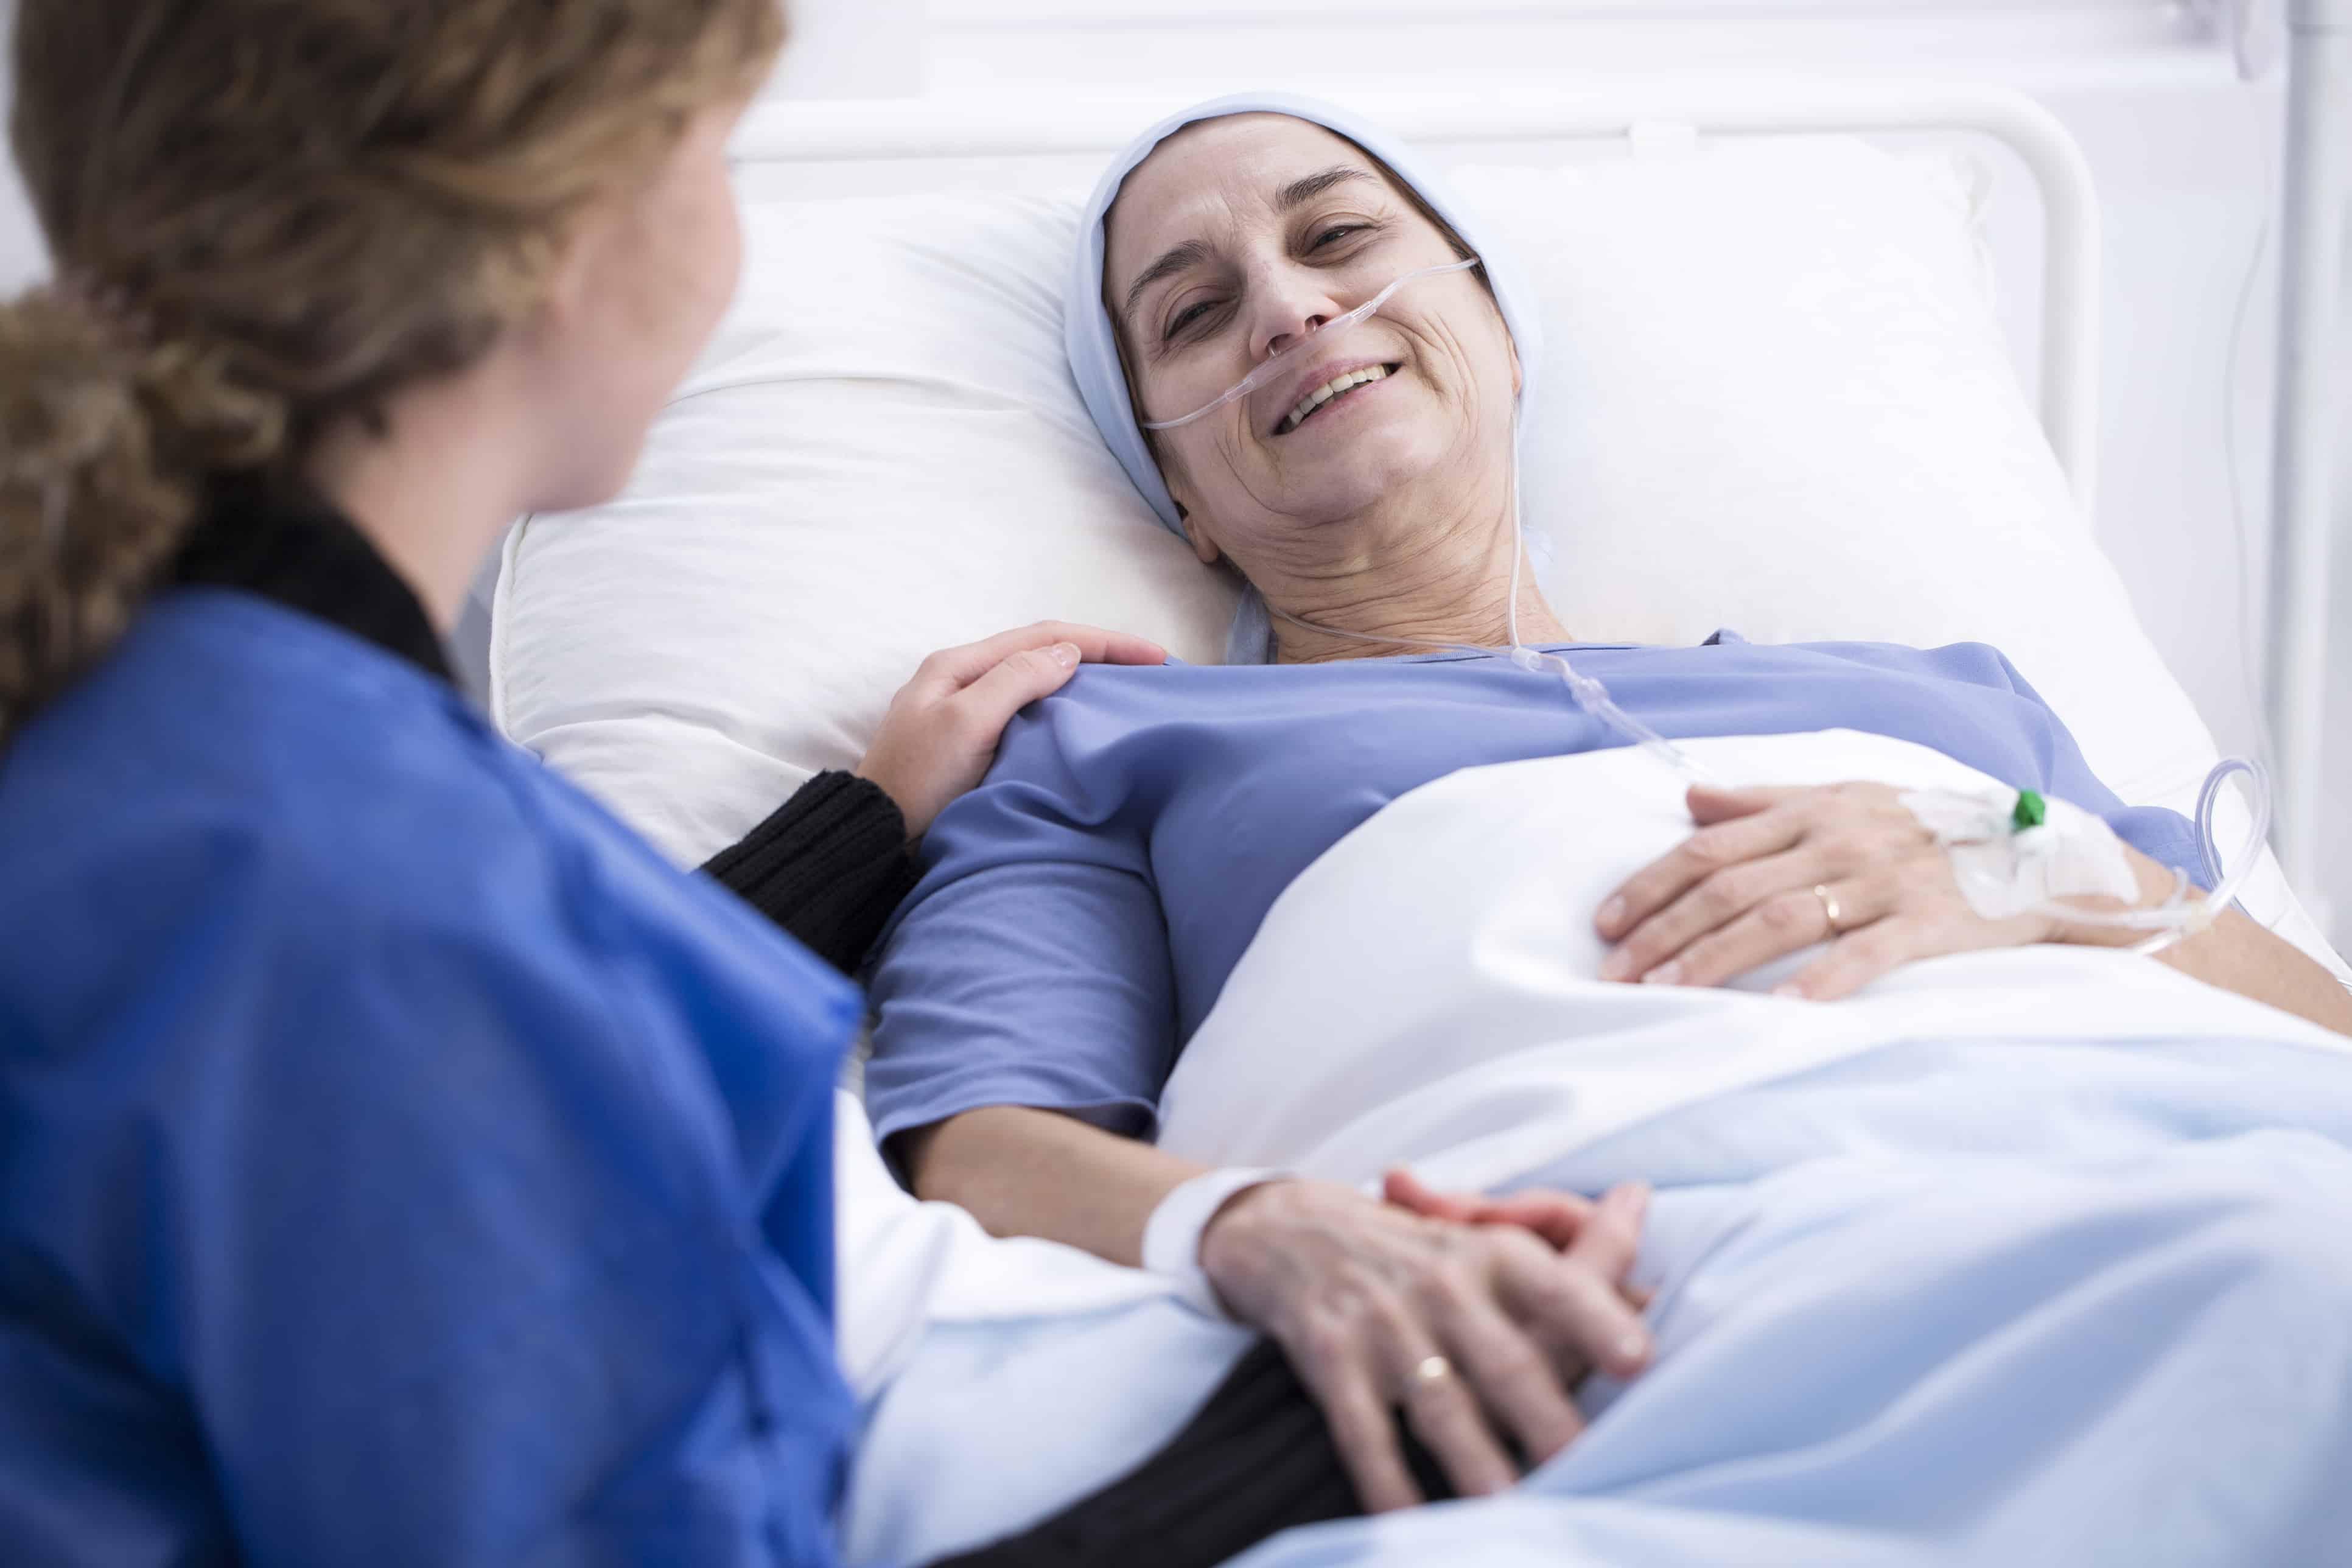 Hospice nurse next to a hospice patient